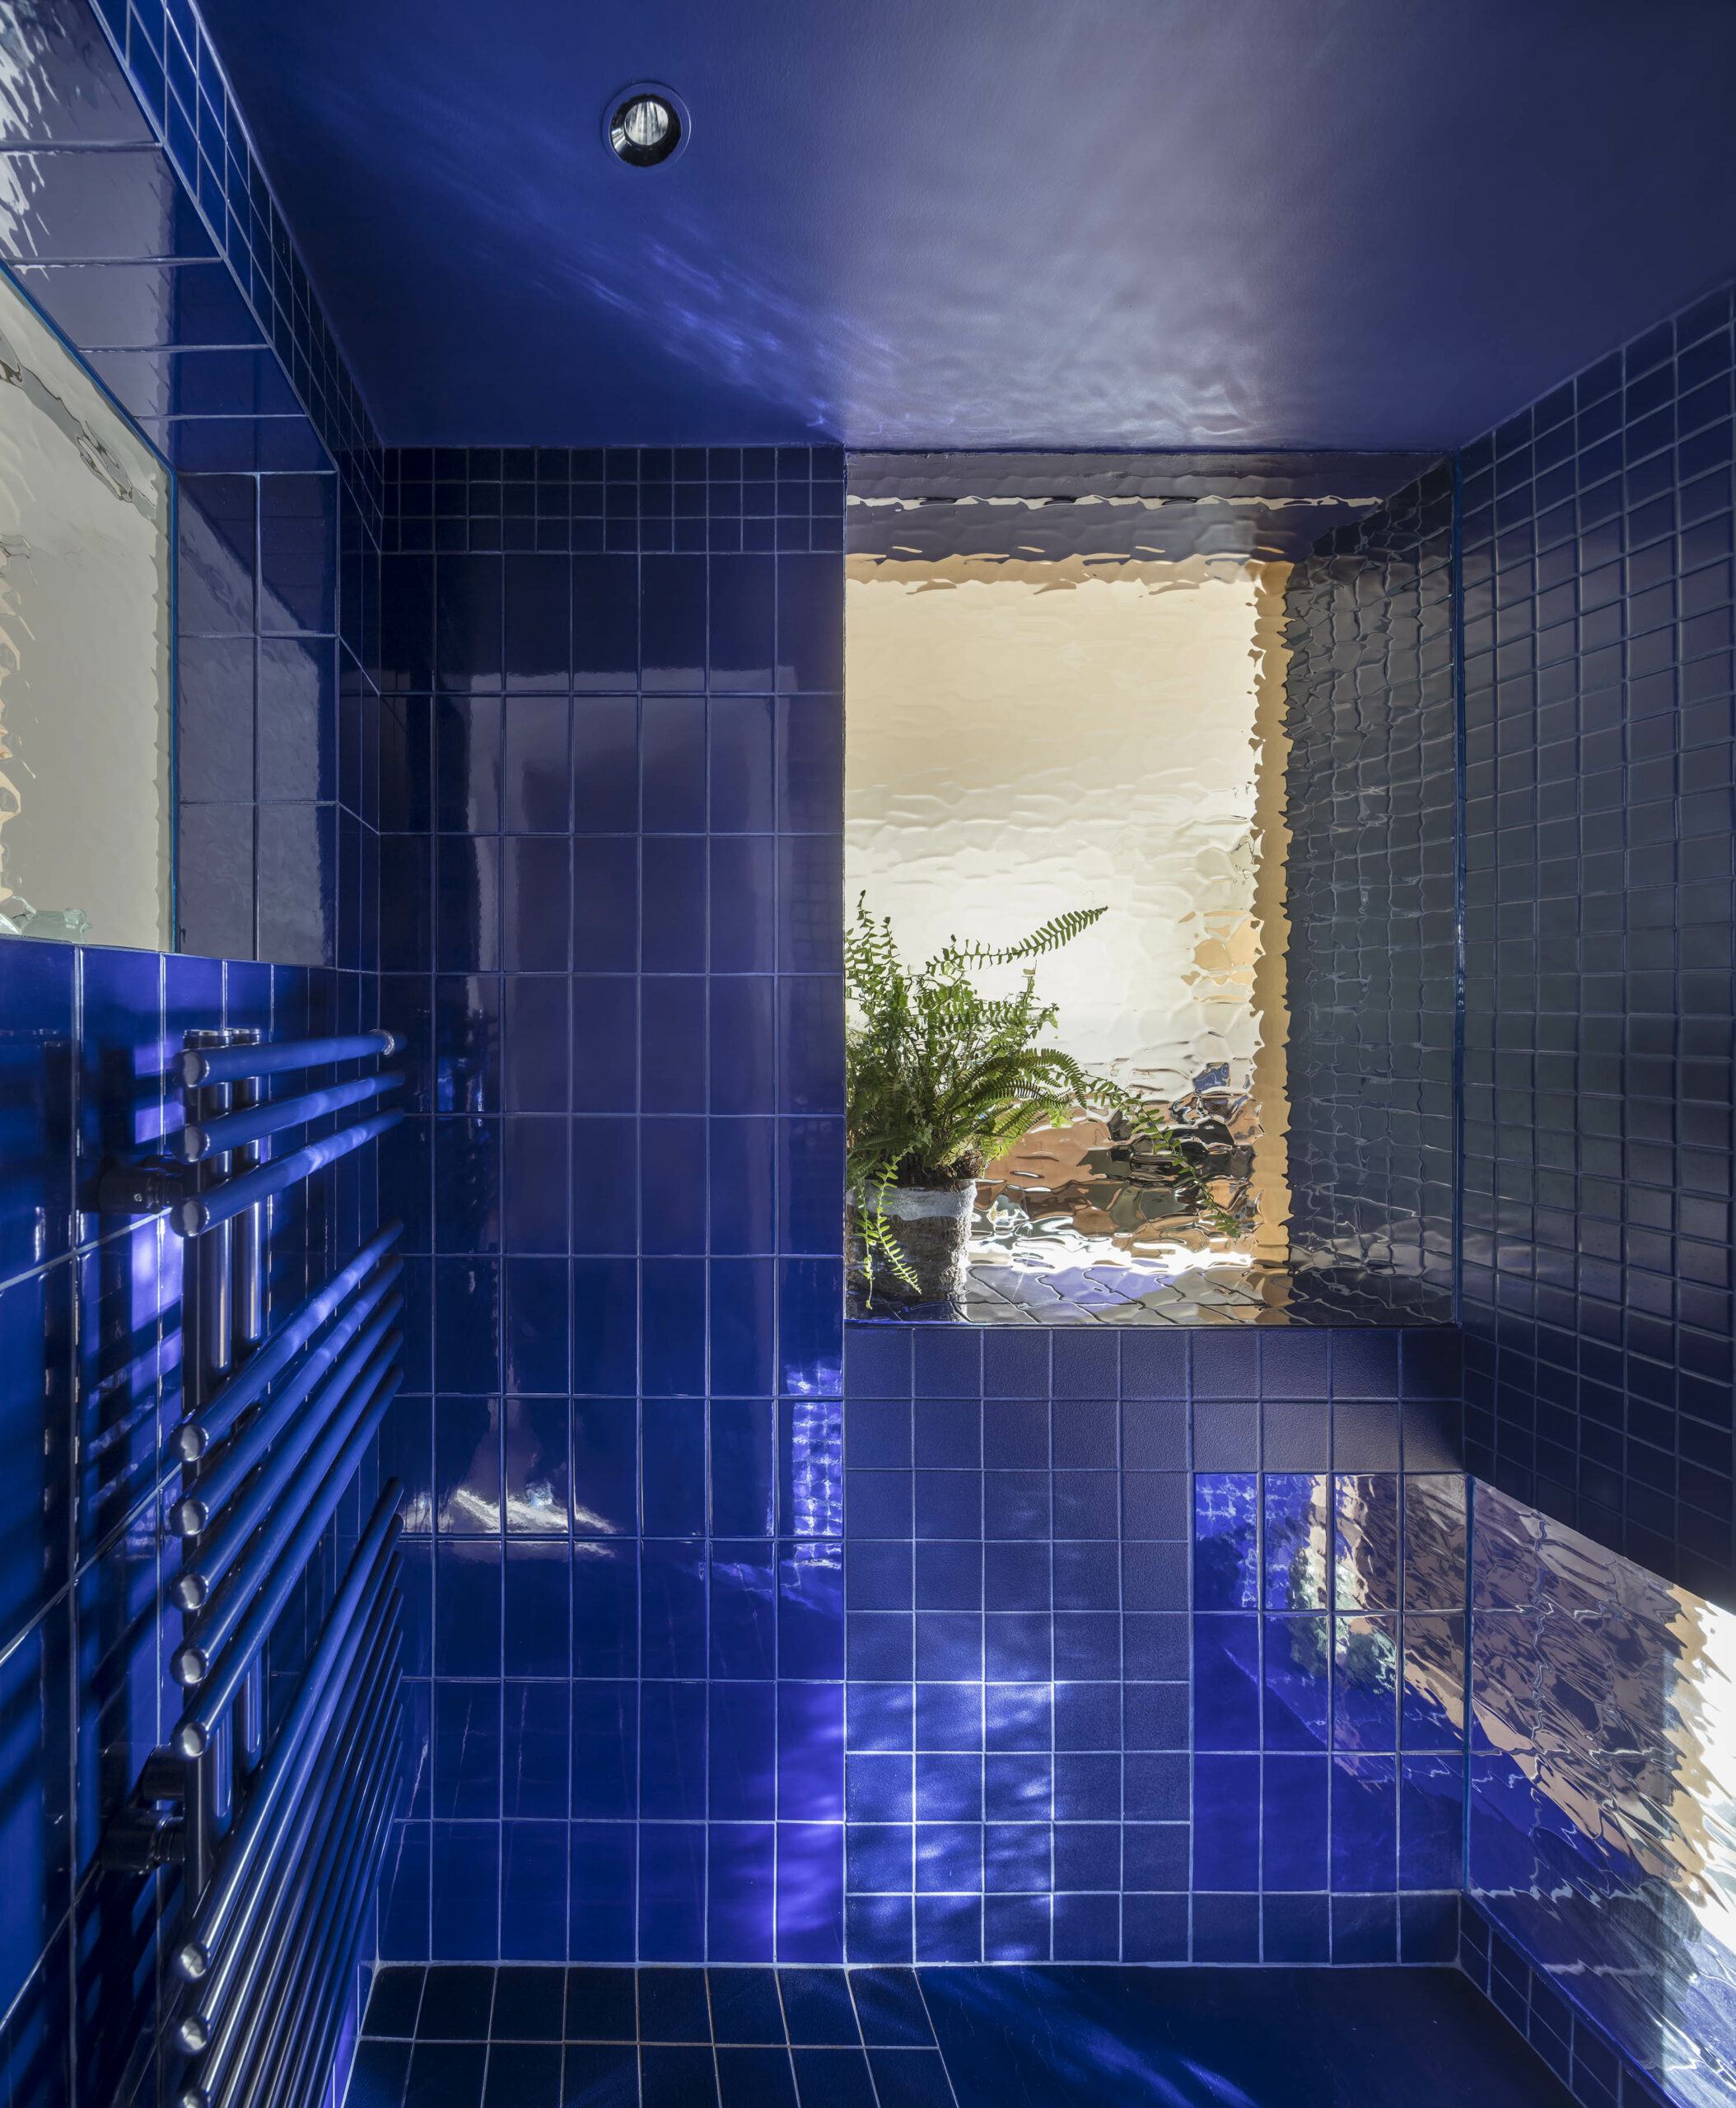 Daylight enters blue-tiled bathroom